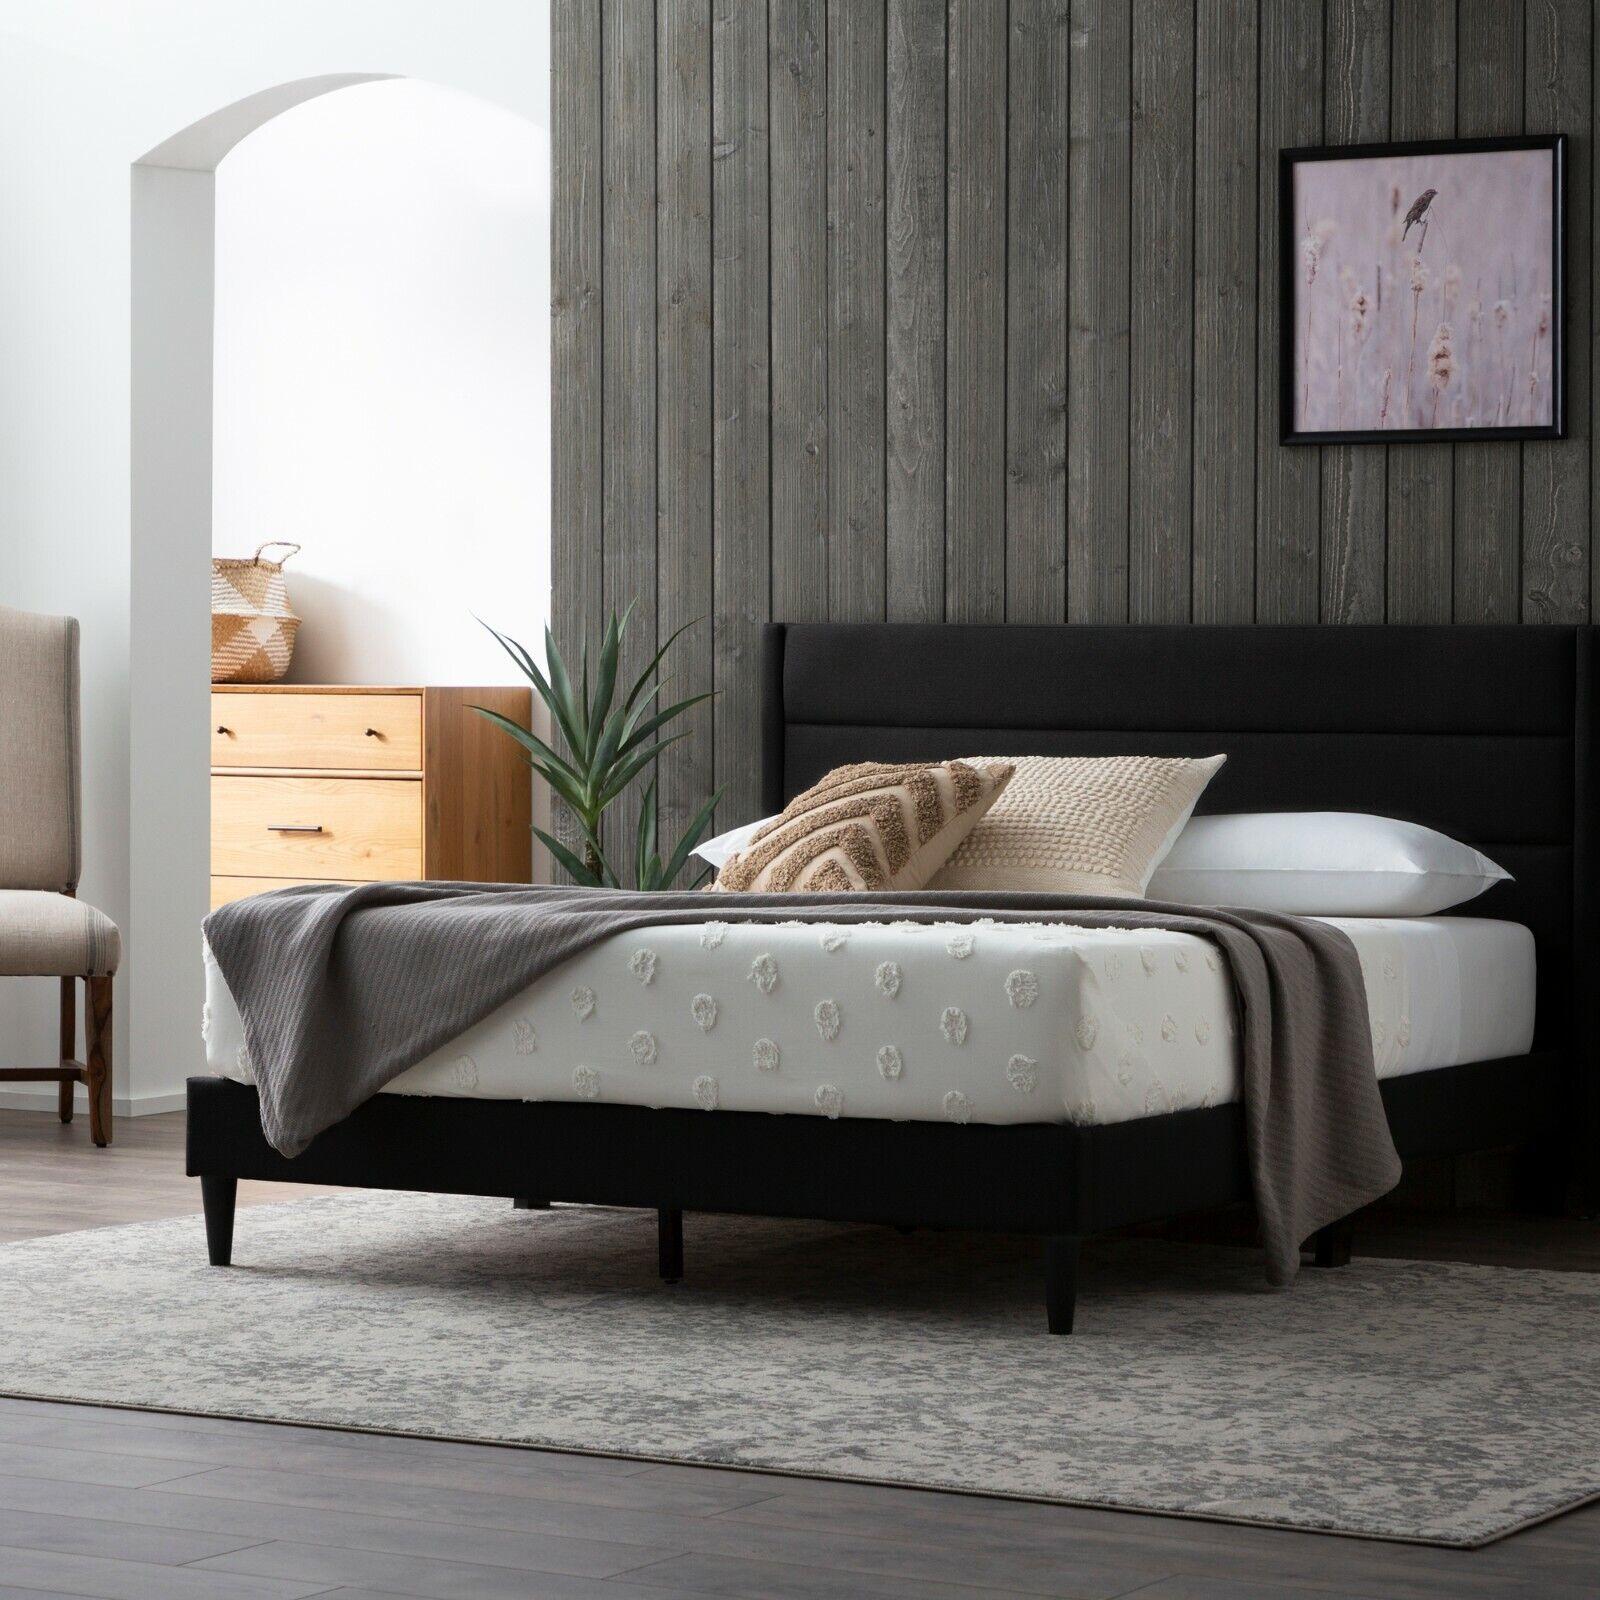 Conner Black California King Upholstered Low Profile Bed For Sale Online Ebay